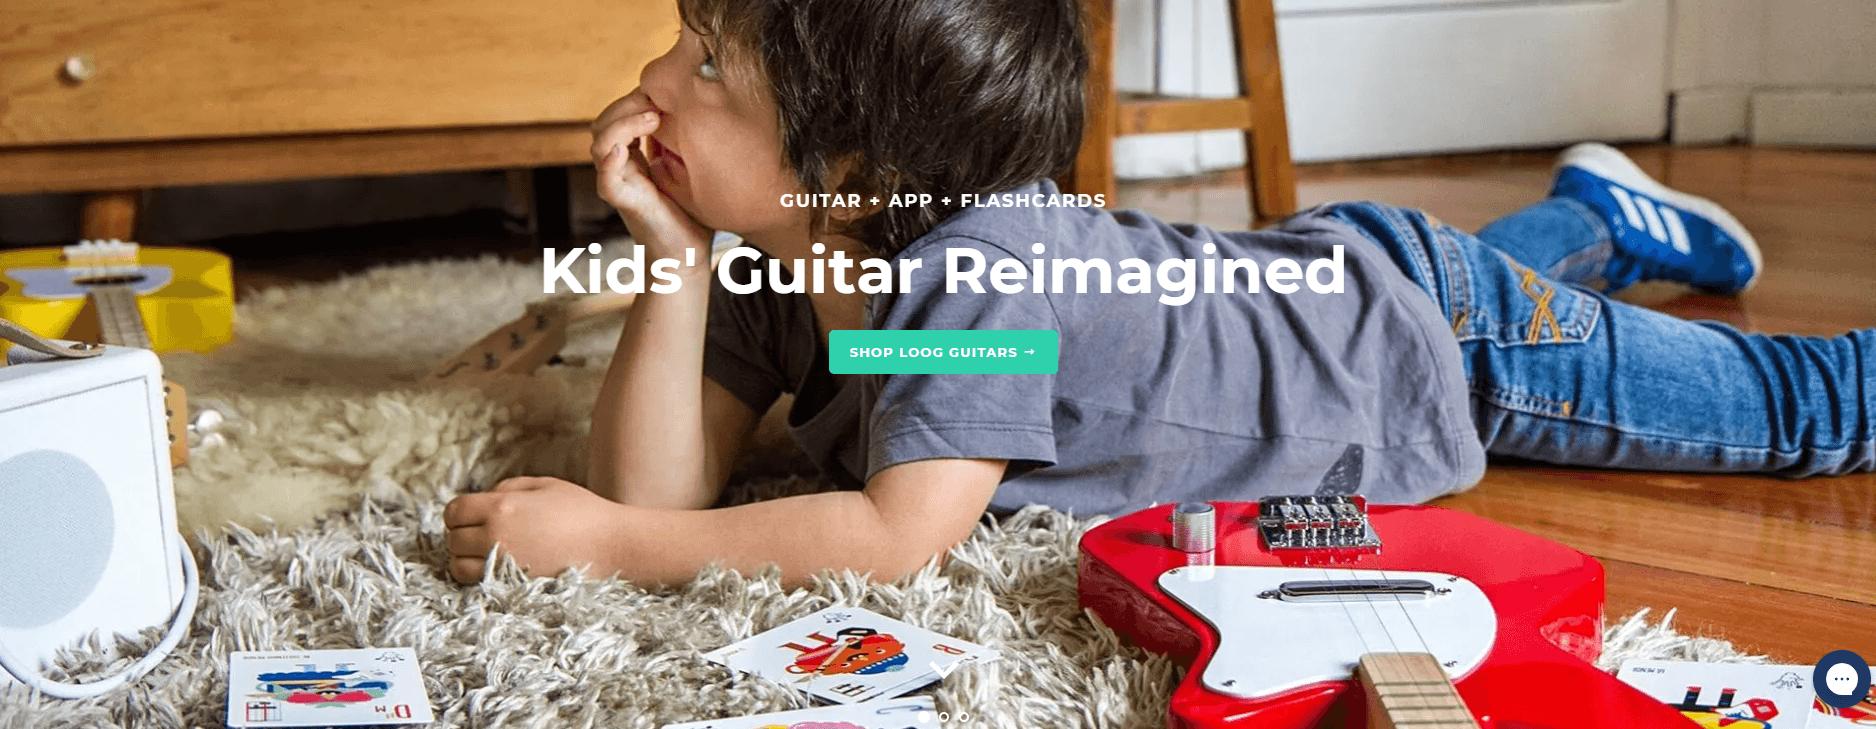 Loog Guitars - Kids' Guitar Reimagined